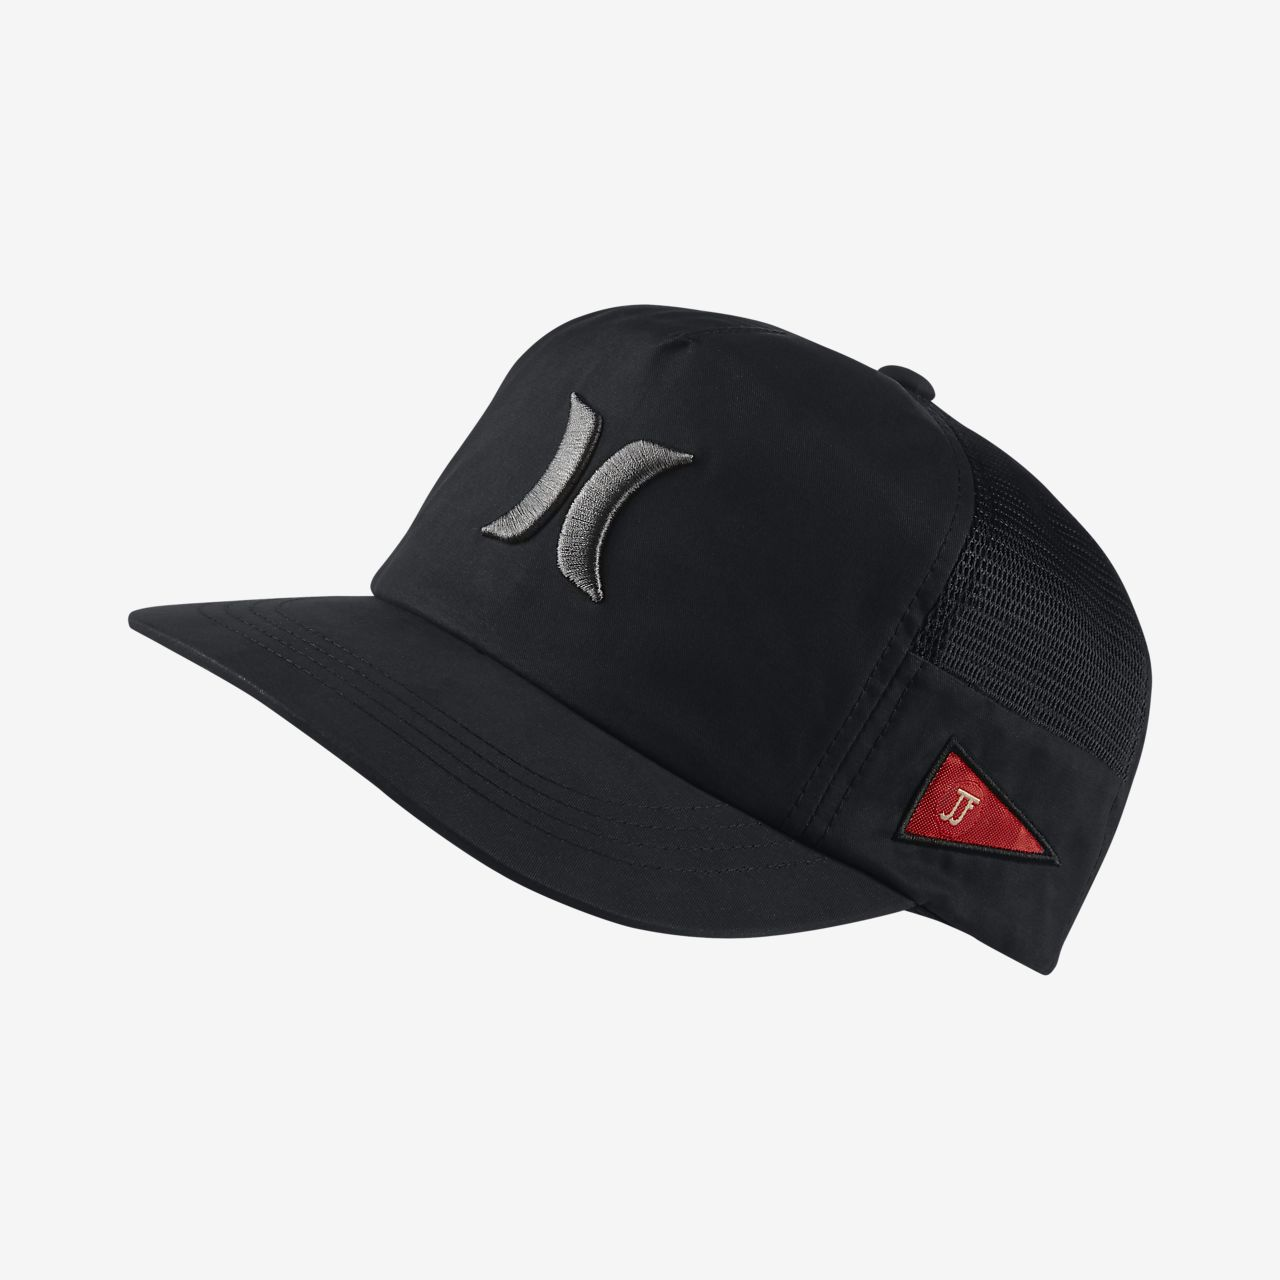 2442793fd65 Hurley Jacare Trucker Men s Adjustable Hat. Nike.com AU